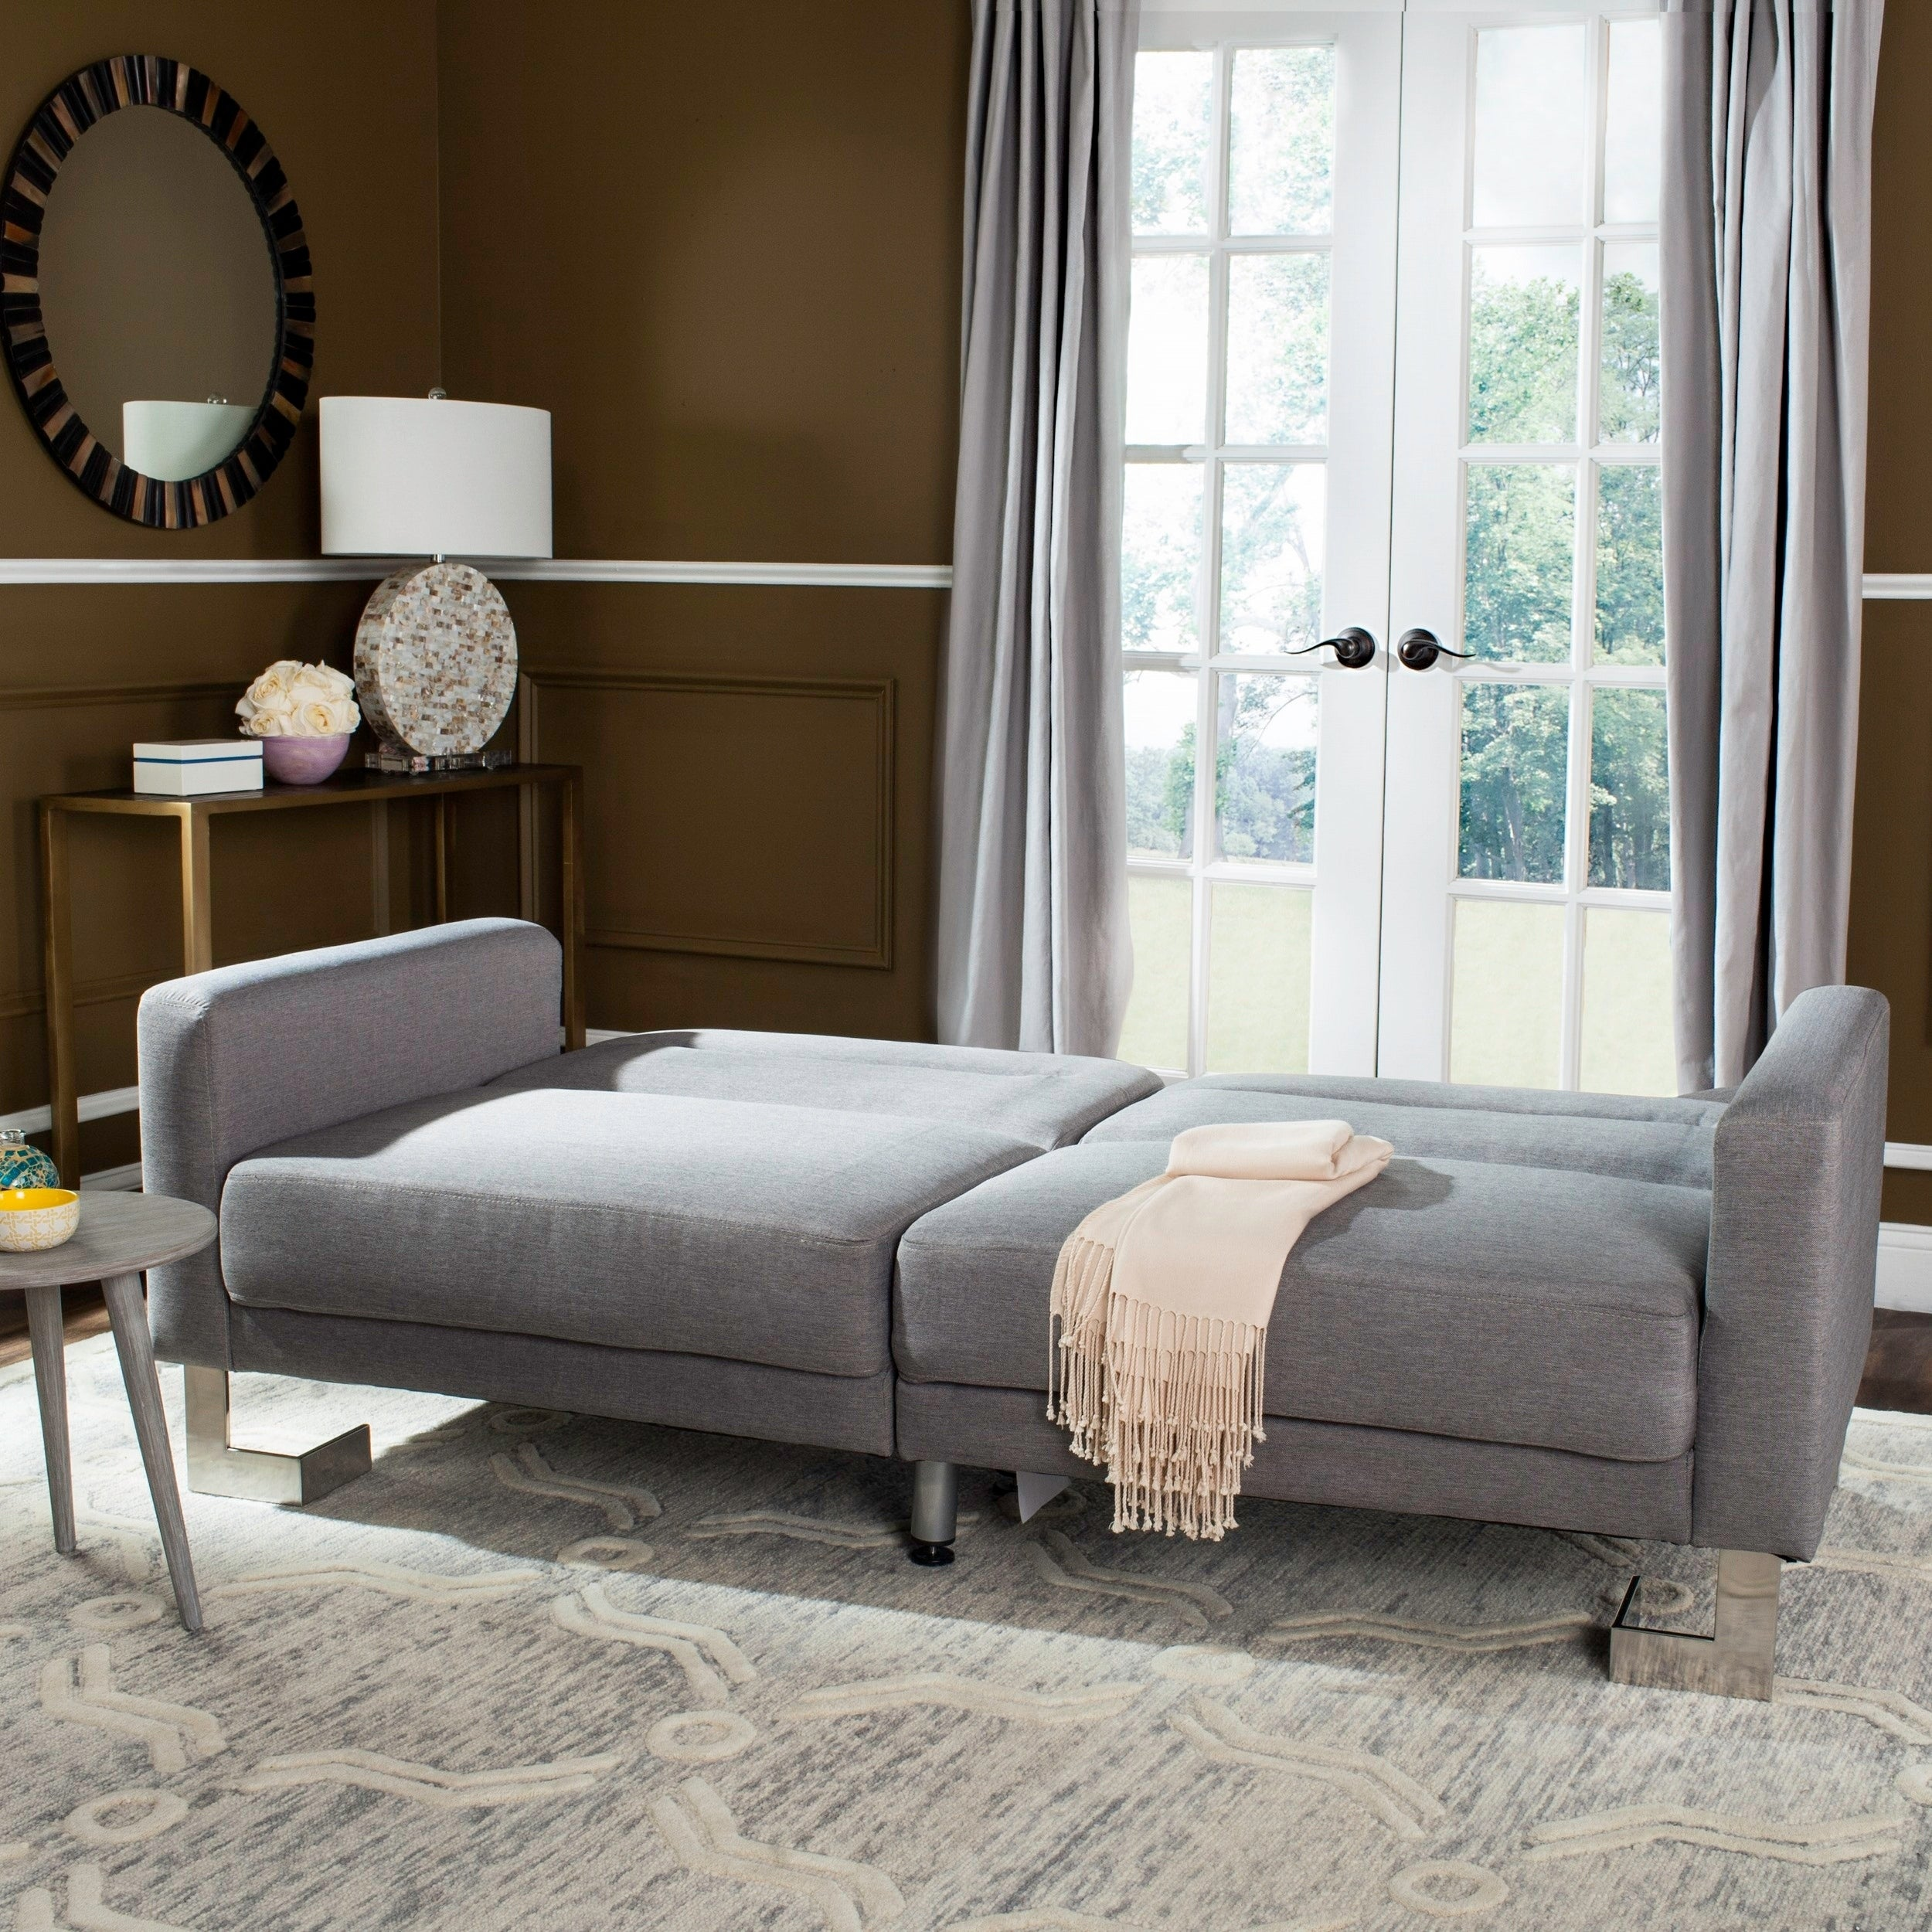 Safavieh Tribeca Two-in-One Modern Foldable Grey Loveseat...